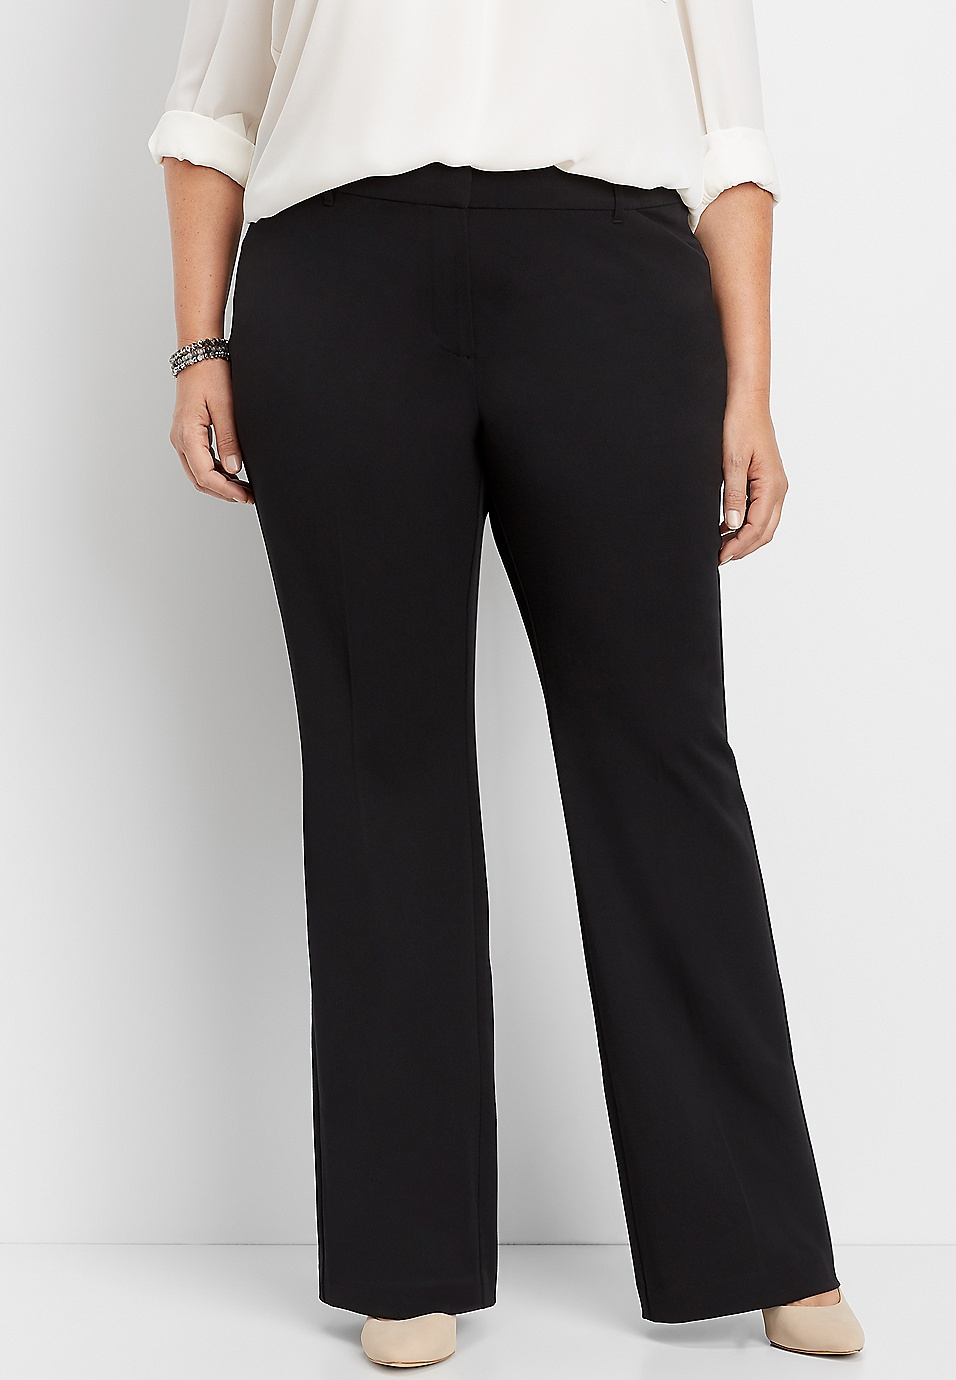 plus size classic black flare pant